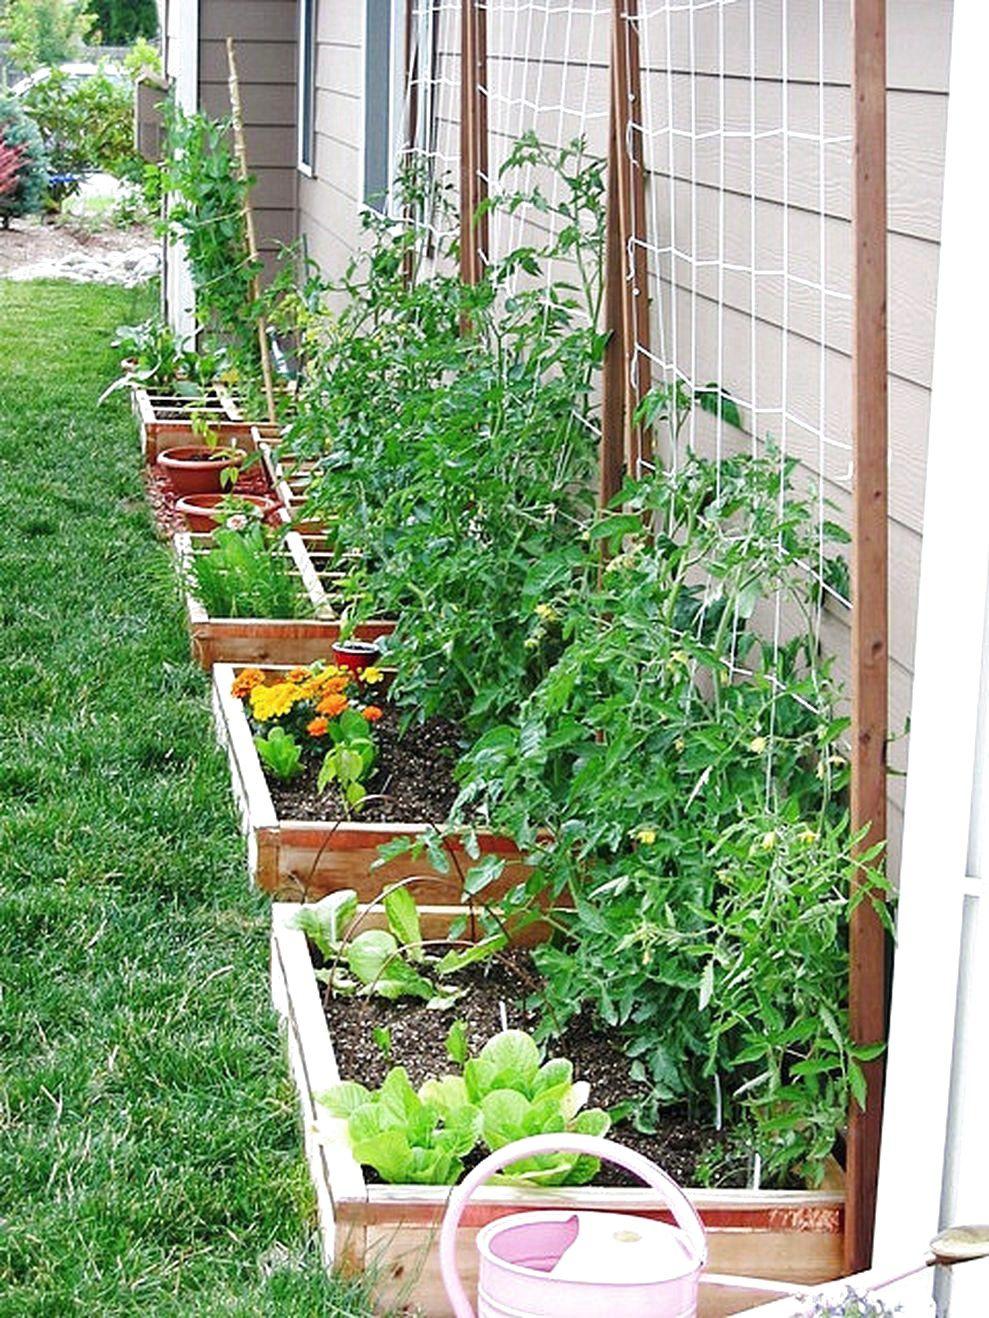 56 Very Beautiful Backyard Vegetable Garden Designs Ideas In 2020 Small Vegetable Gardens Home Vegetable Garden Vegetable Garden Raised Beds